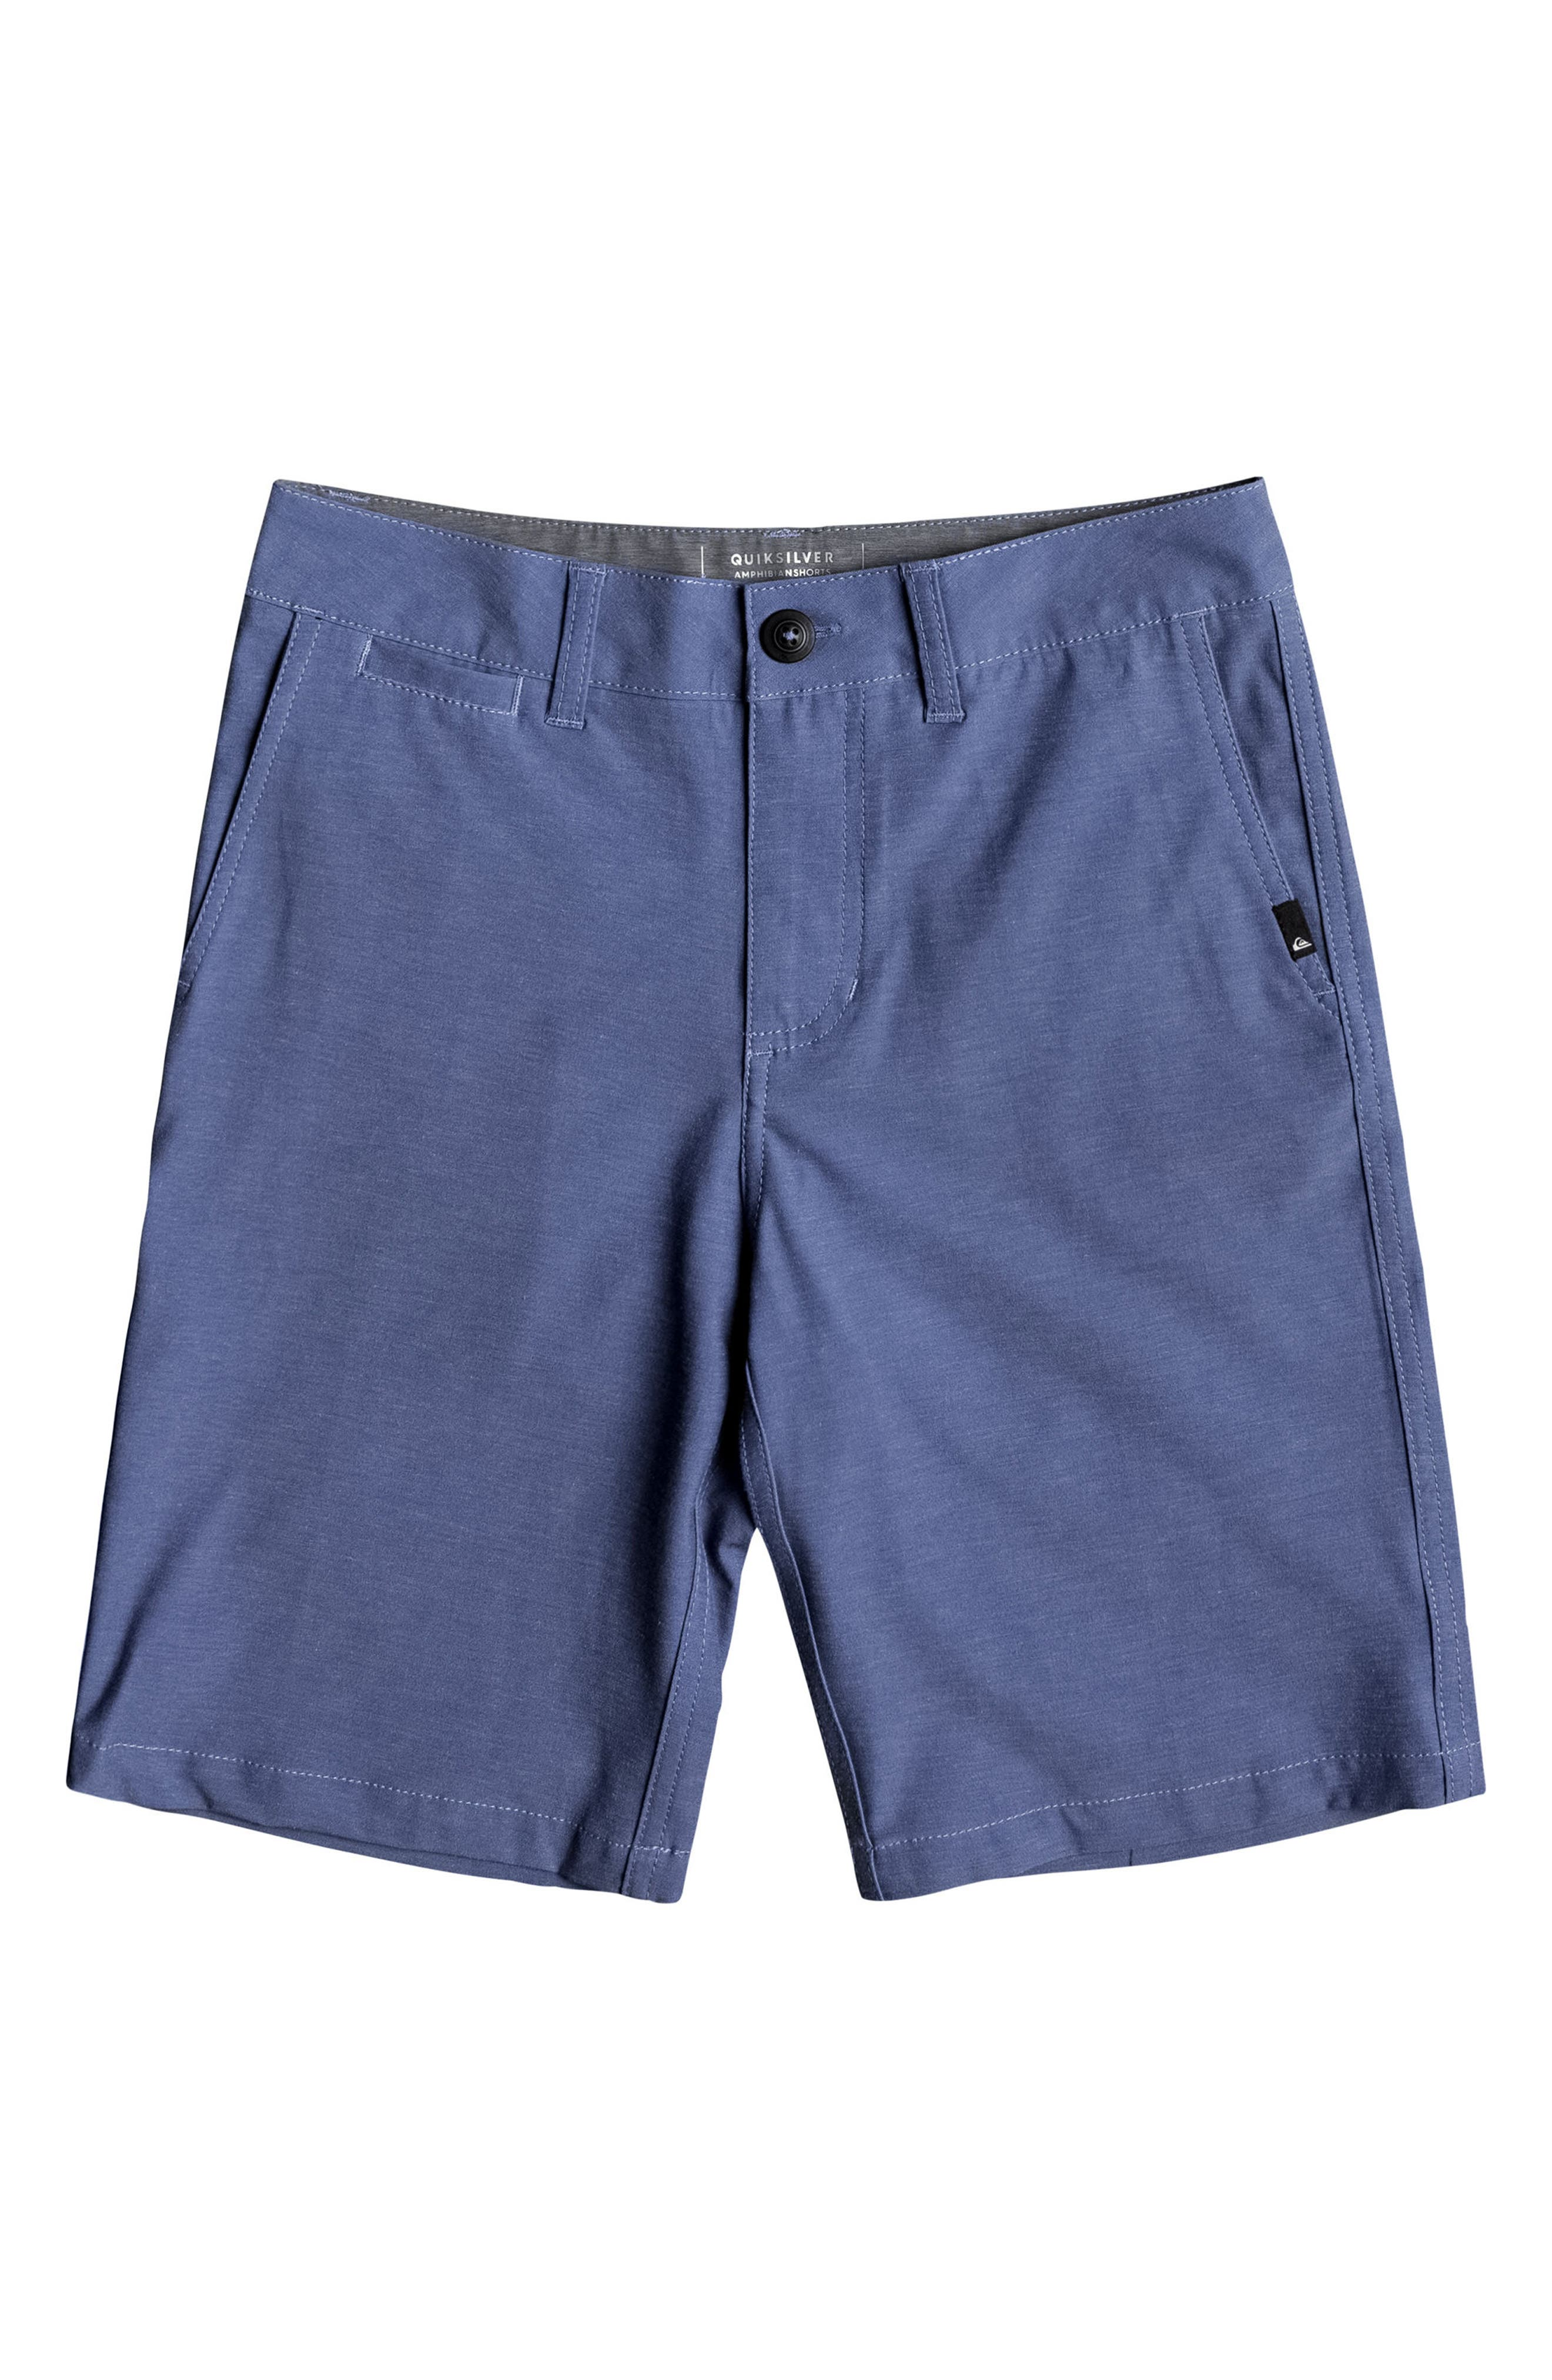 Amphibian Hybrid Shorts,                         Main,                         color, 417